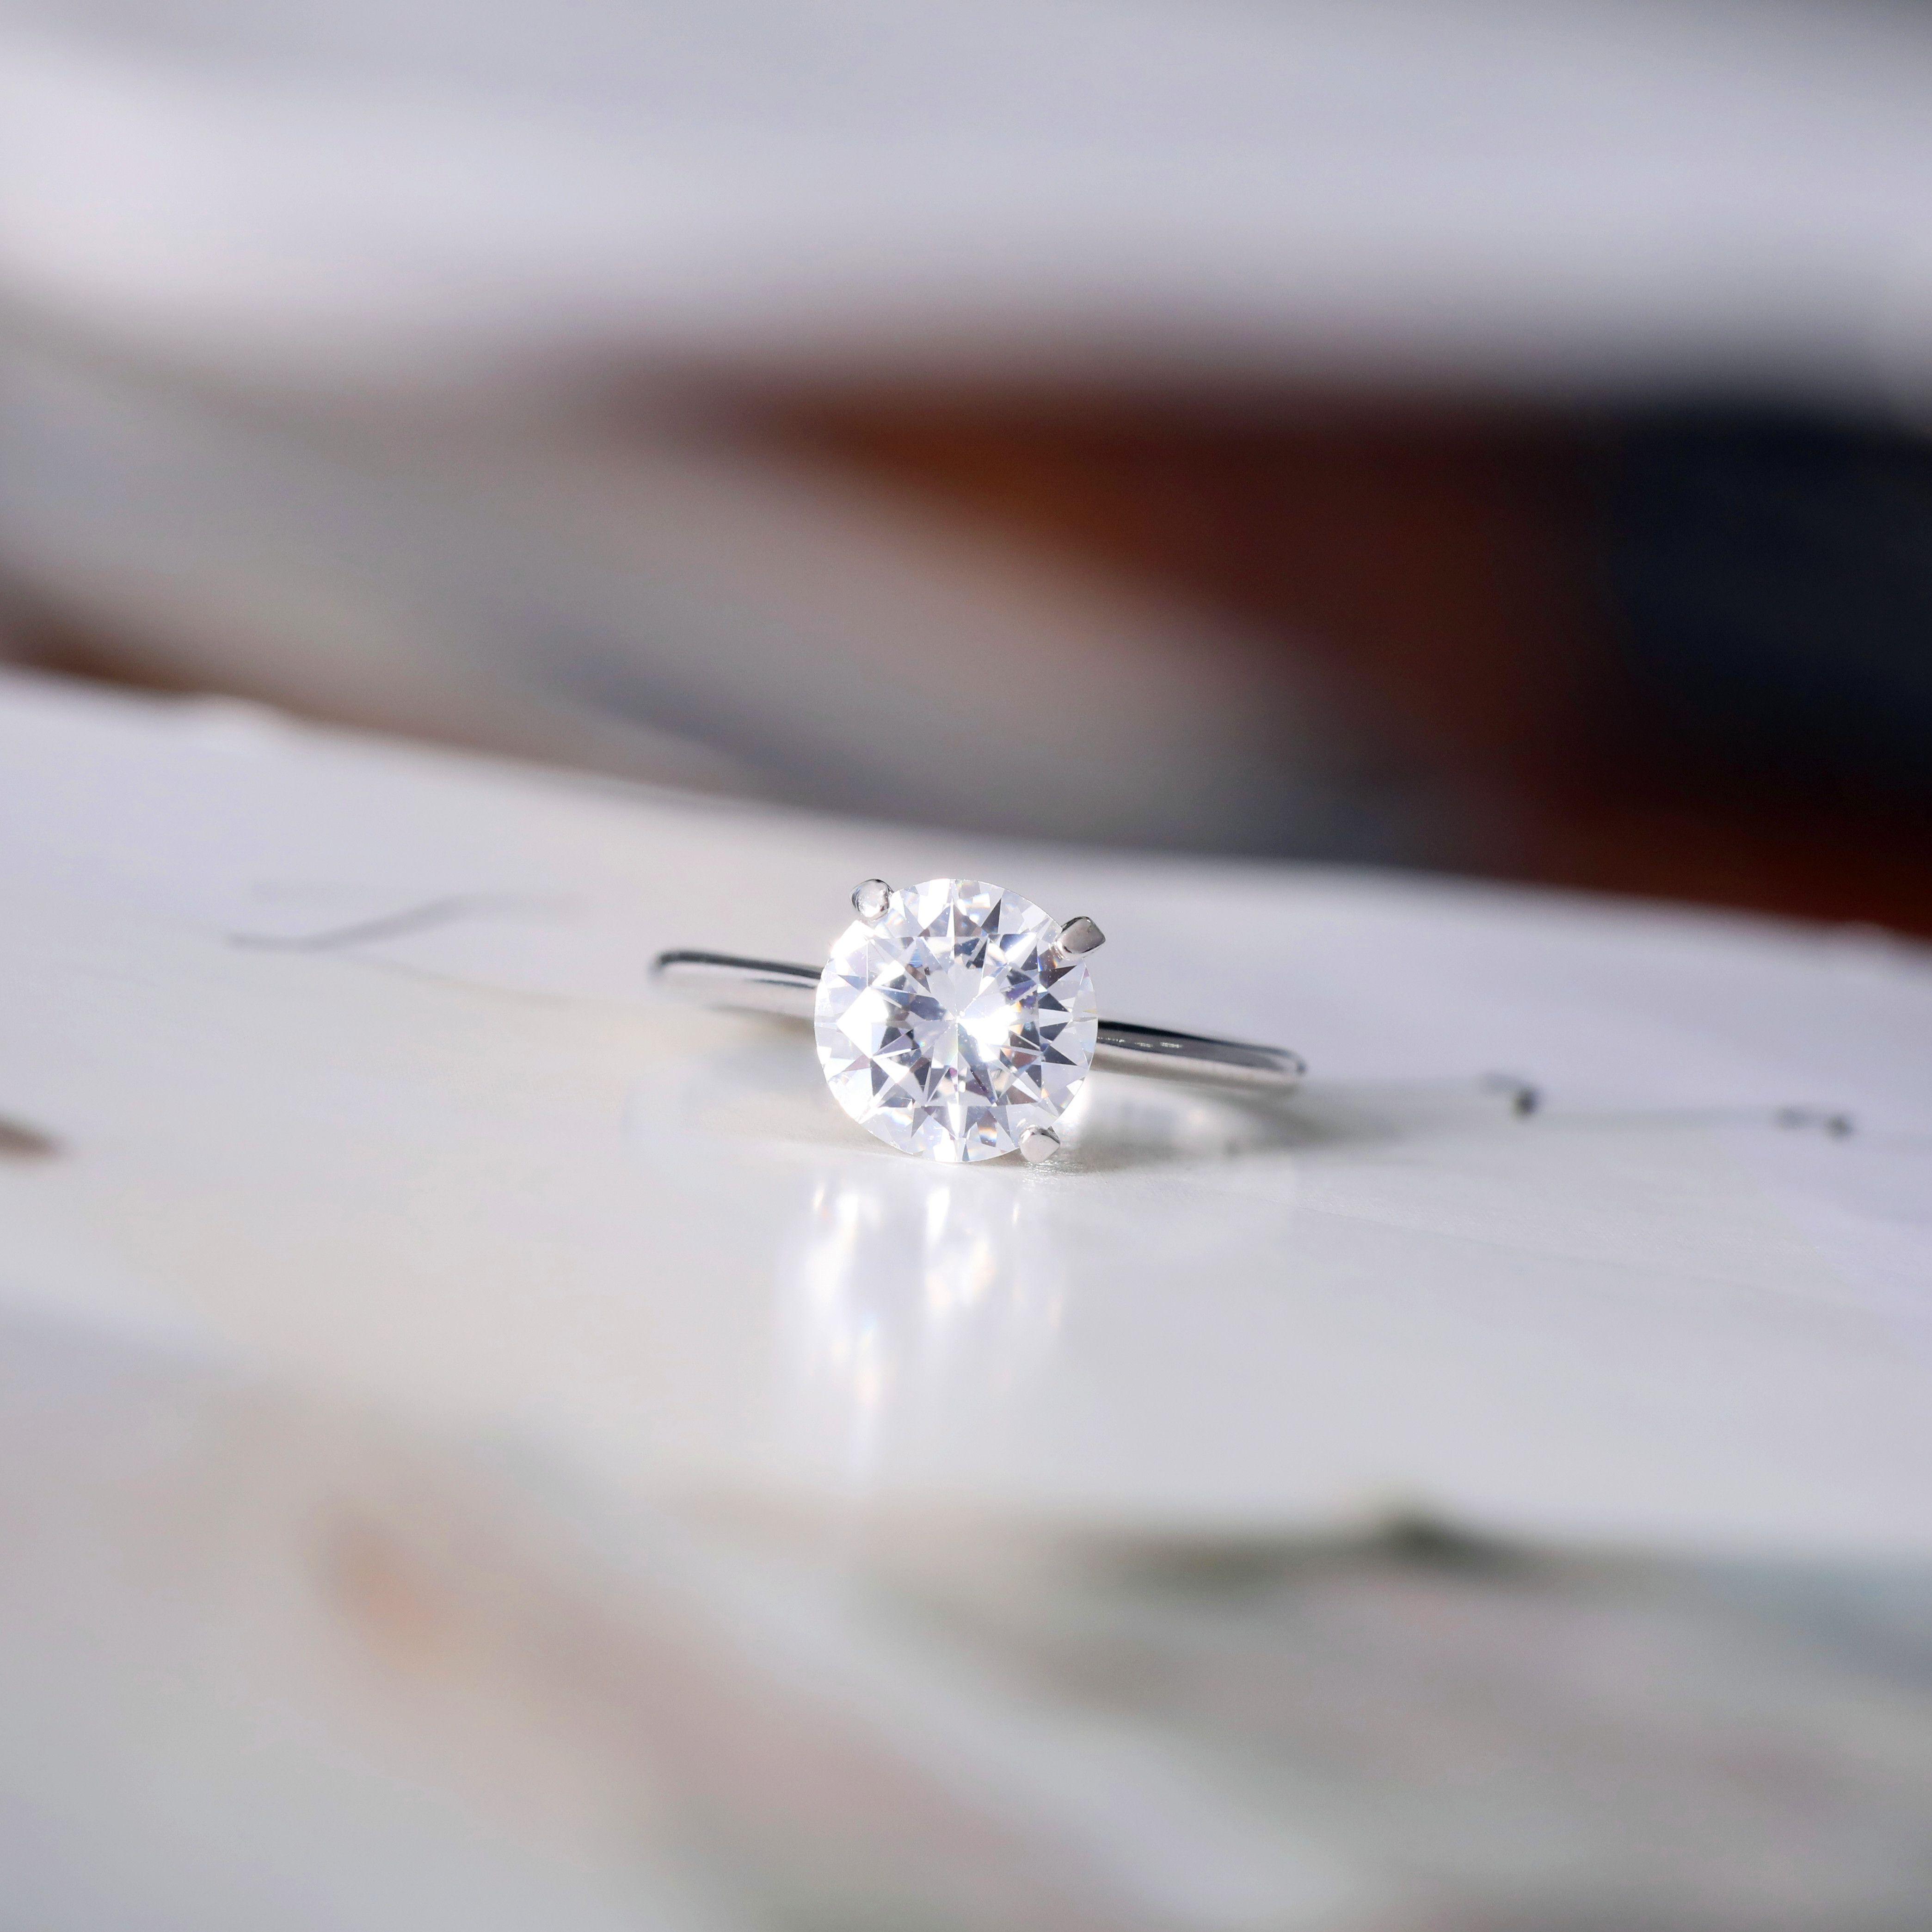 Cubic Zirconia Wedding Rings Sterling Silver Four Claws Sterling Silver Wedding Rings Cubic Zirconia Wedding Rings Wedding Rings For Women